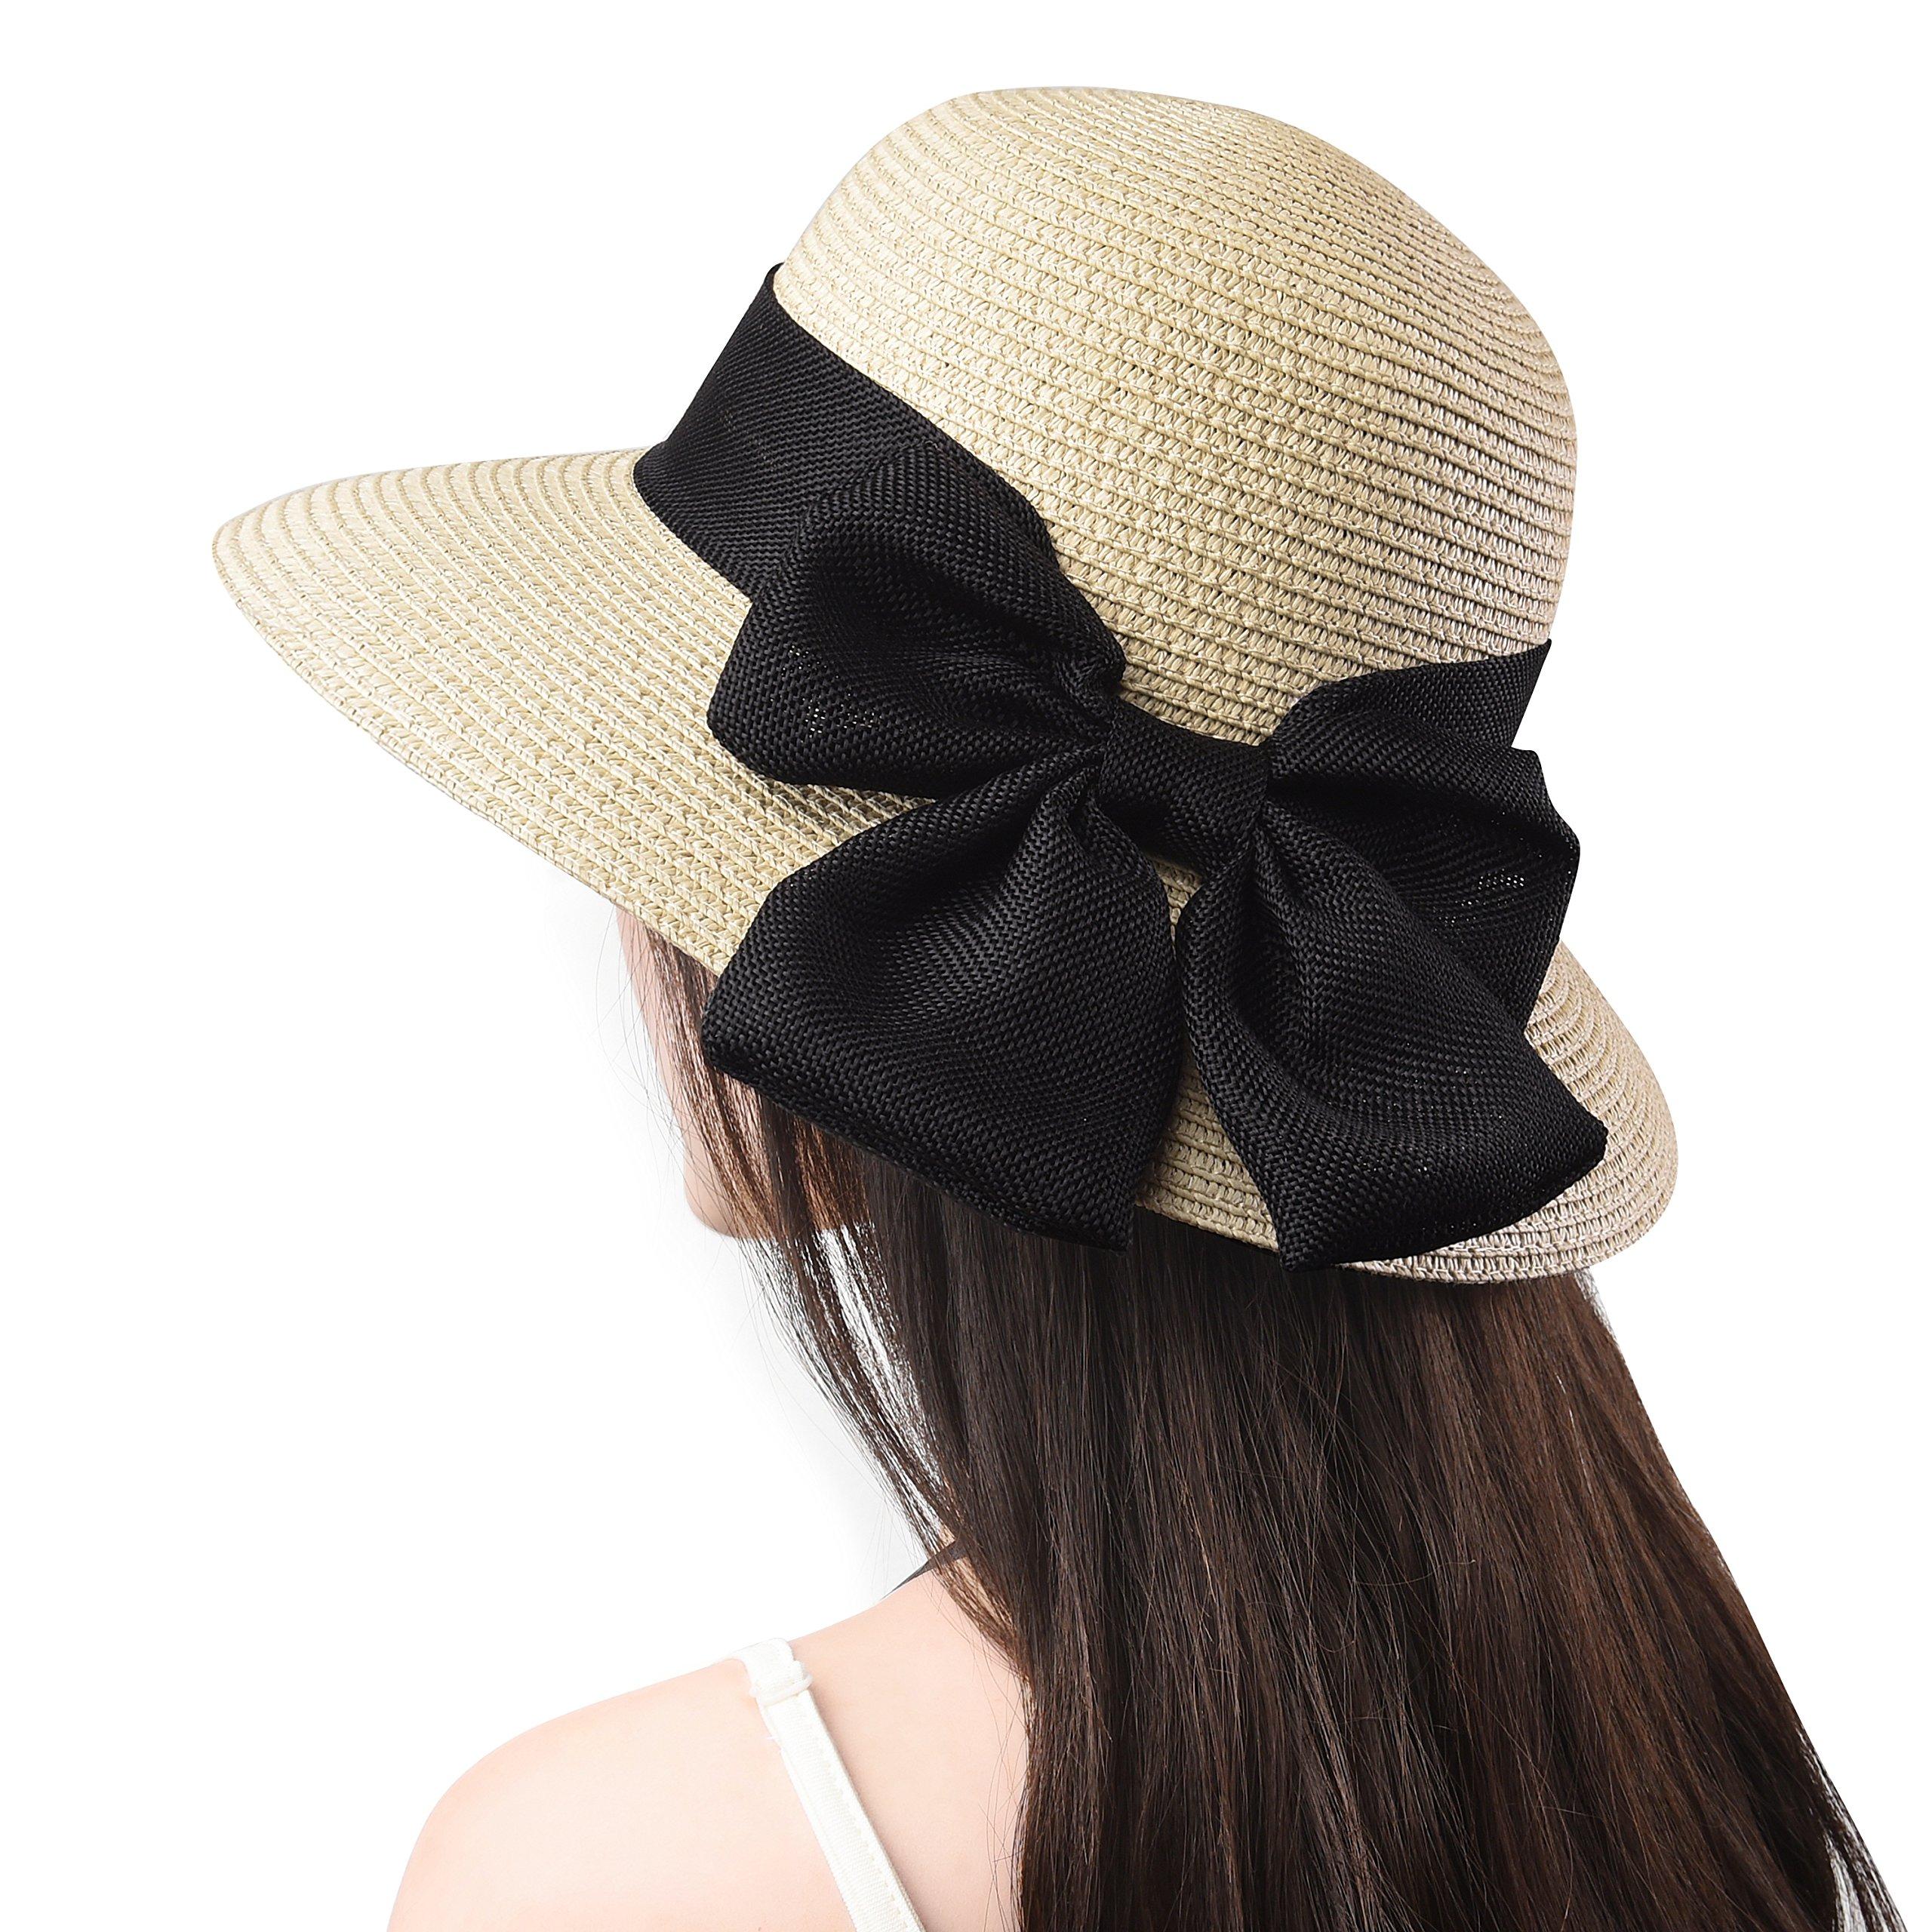 152473bc Details about Jogoo Women Sun Beach Hats,Wide Brim Straw Hat,Unique  Windproof Strap